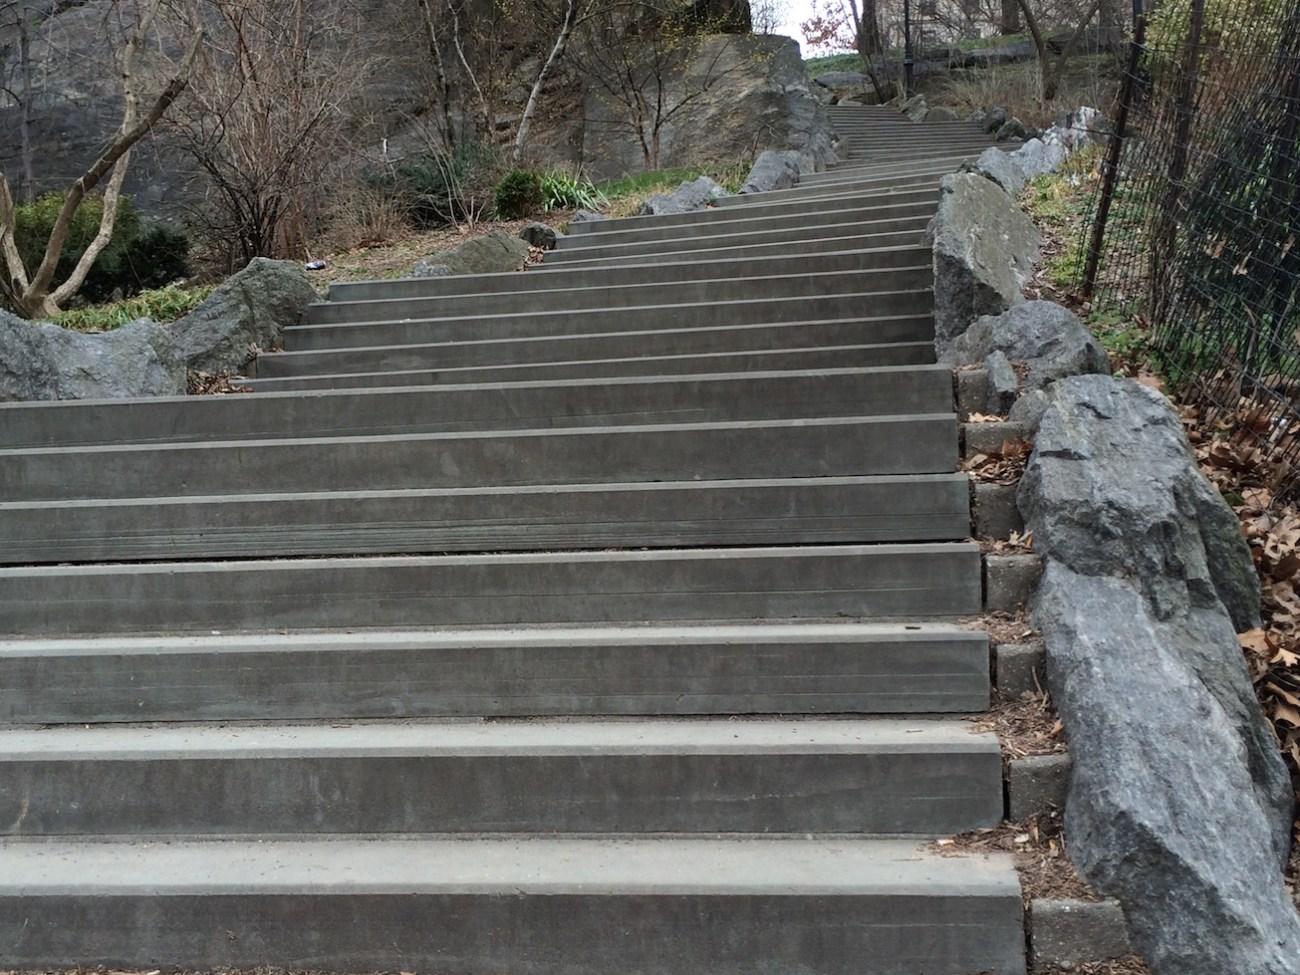 Morningside Park Stair Workout 23